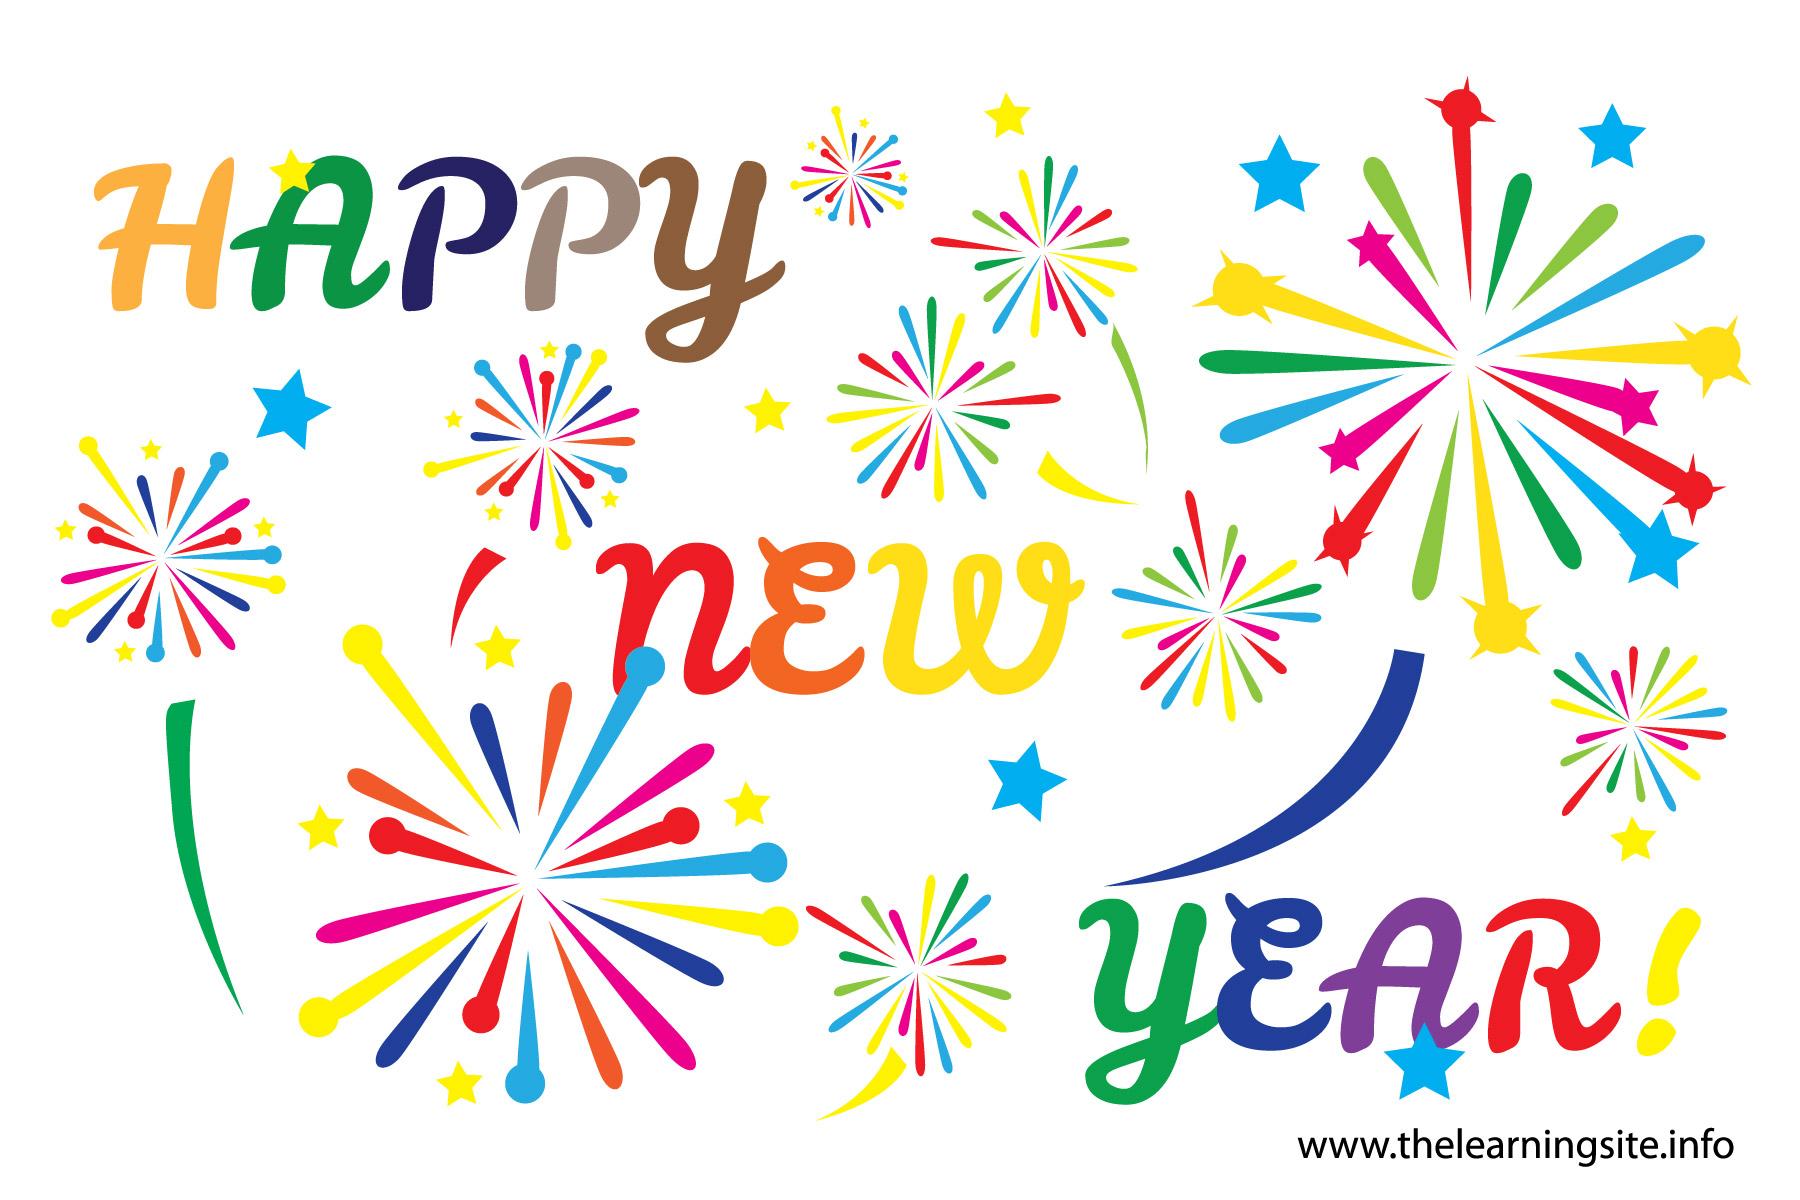 Happy-new-year-clipart-.jpg